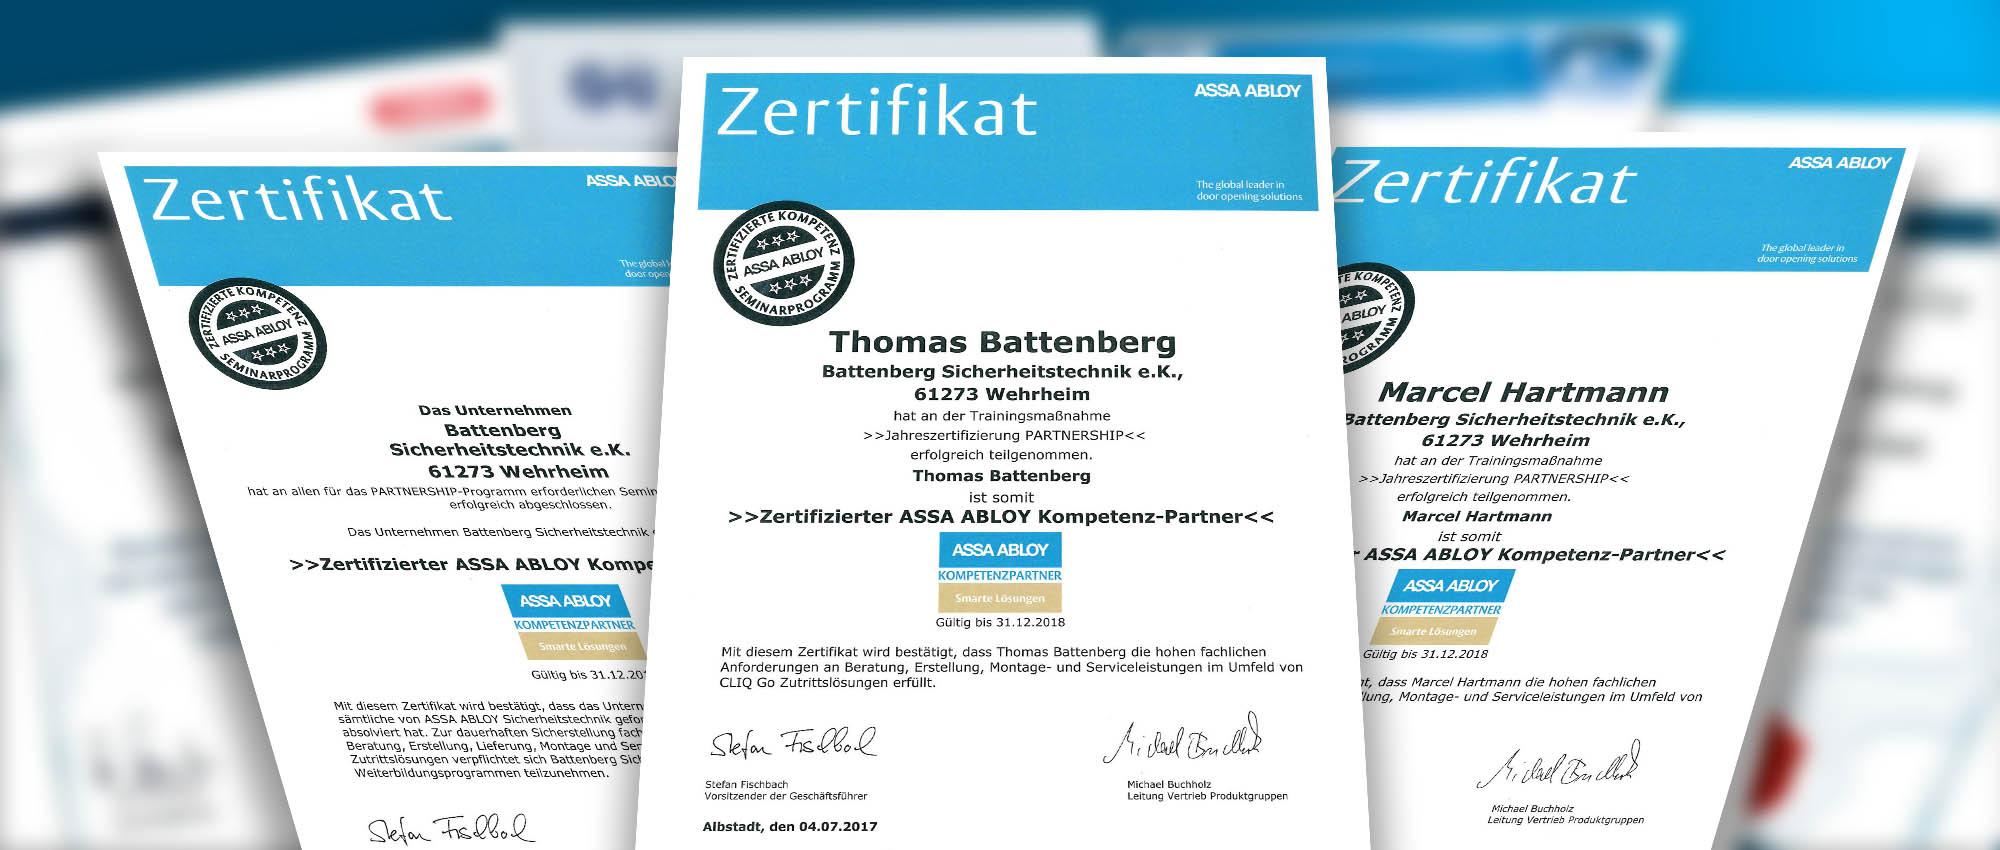 assa-abloy-zertifikate